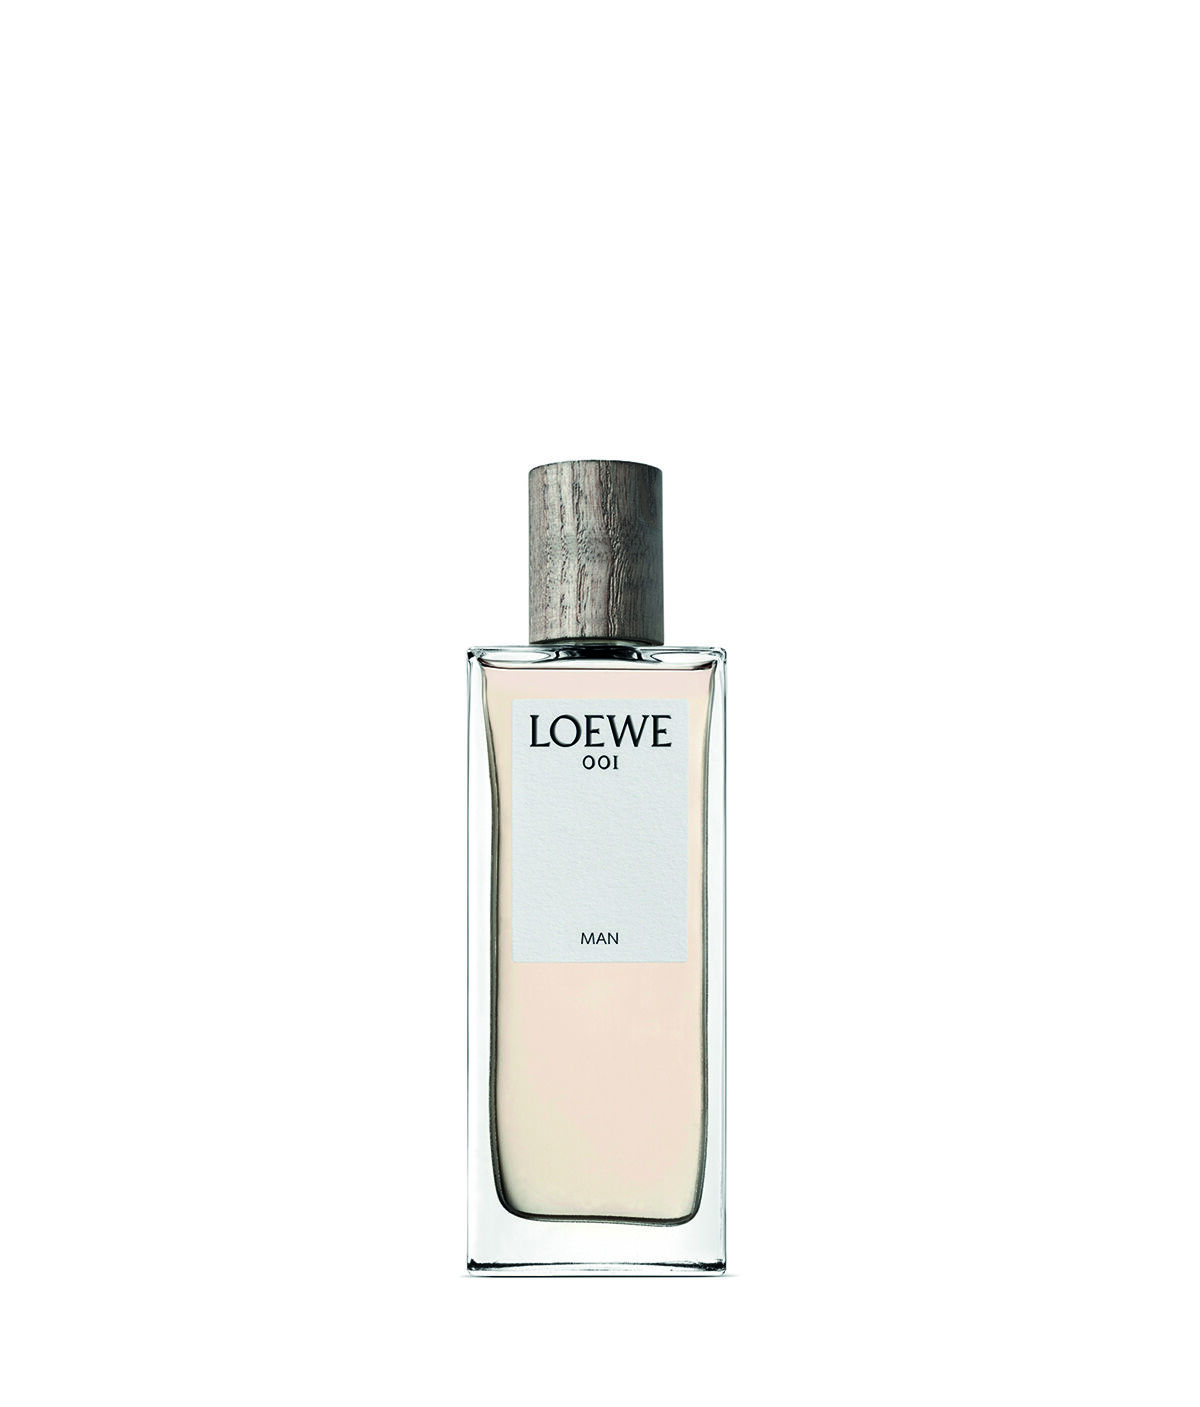 LOEWE Loewe 001 Man Edp 50Ml Colourless all